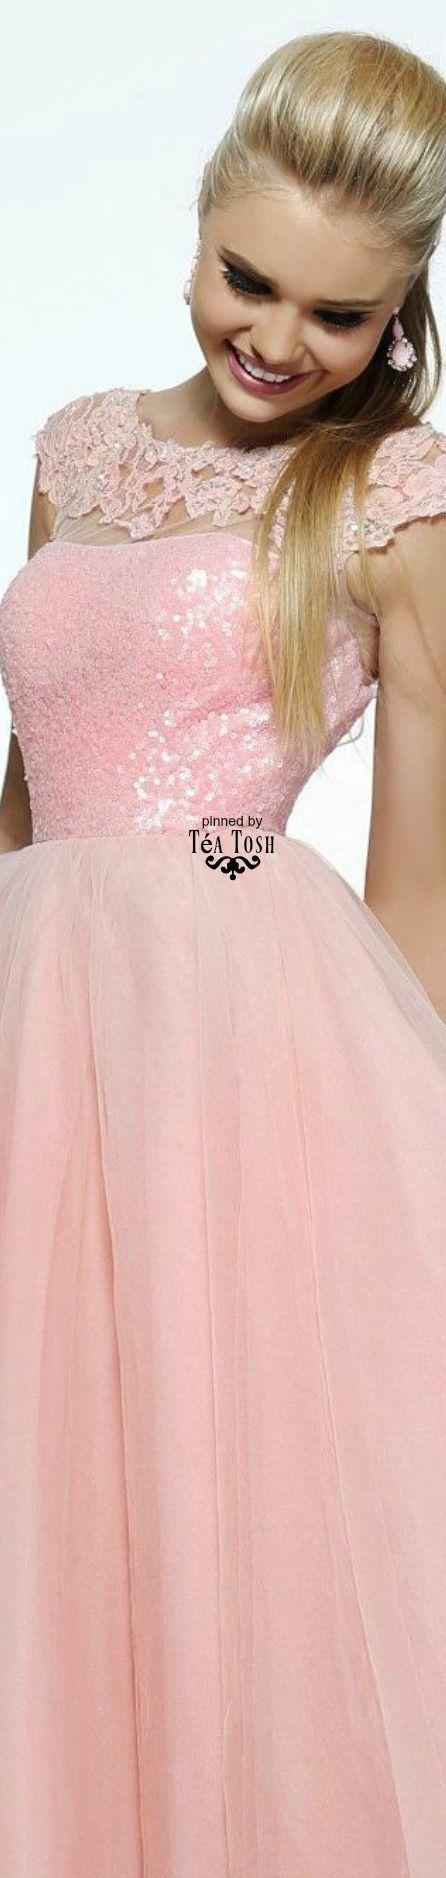 Pin von CharmedbyBonnie auf Fashion Flirty and Fun   Pinterest